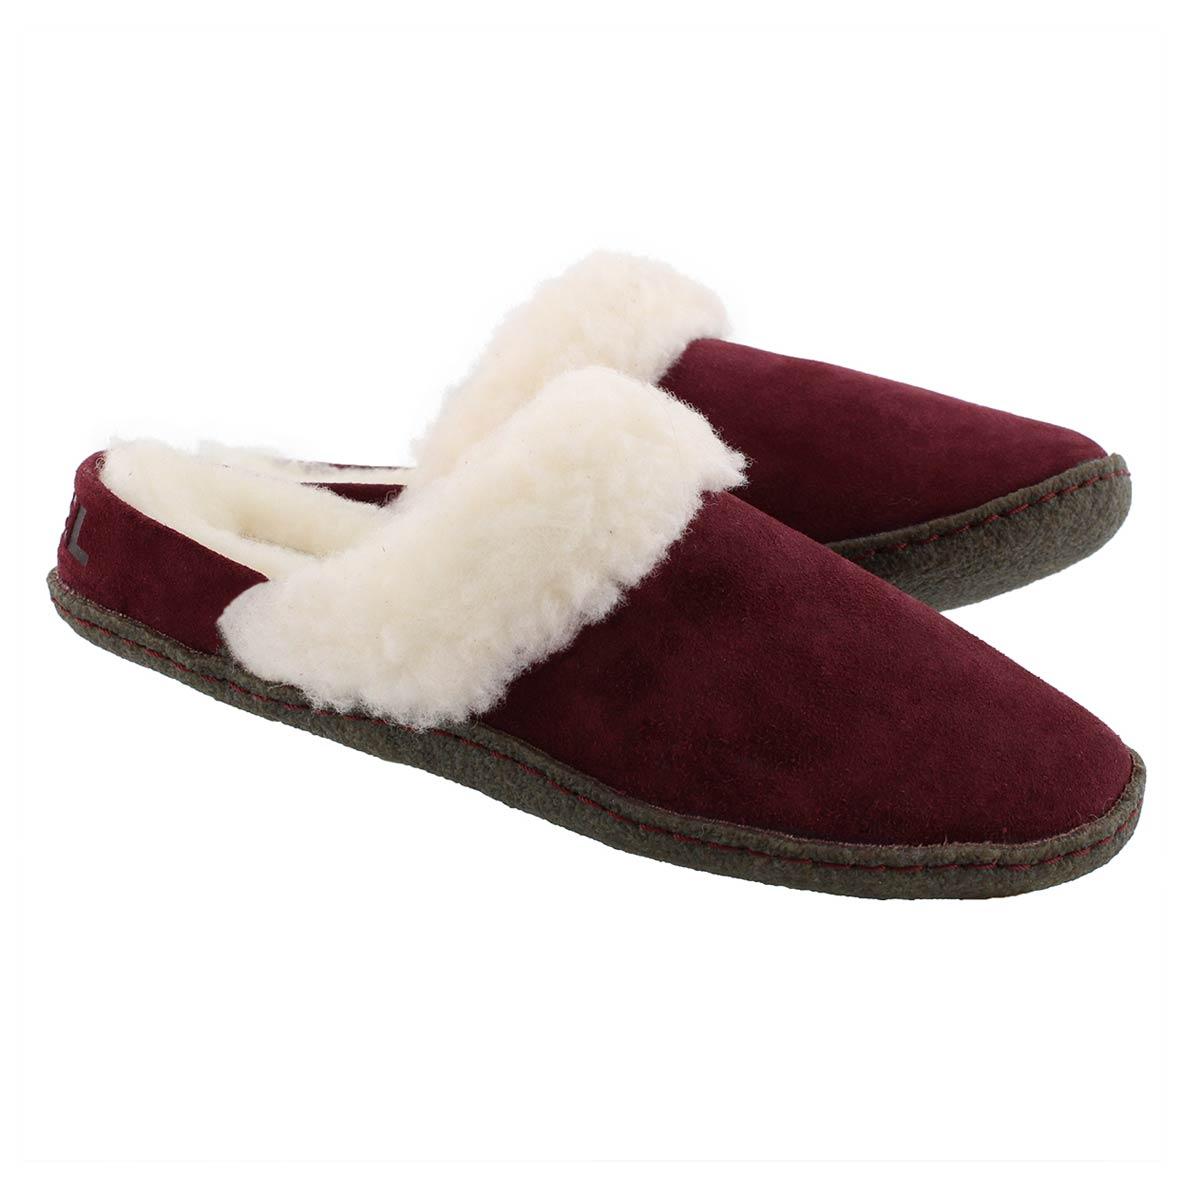 Lds Nakiska Slide II rich wine slipper